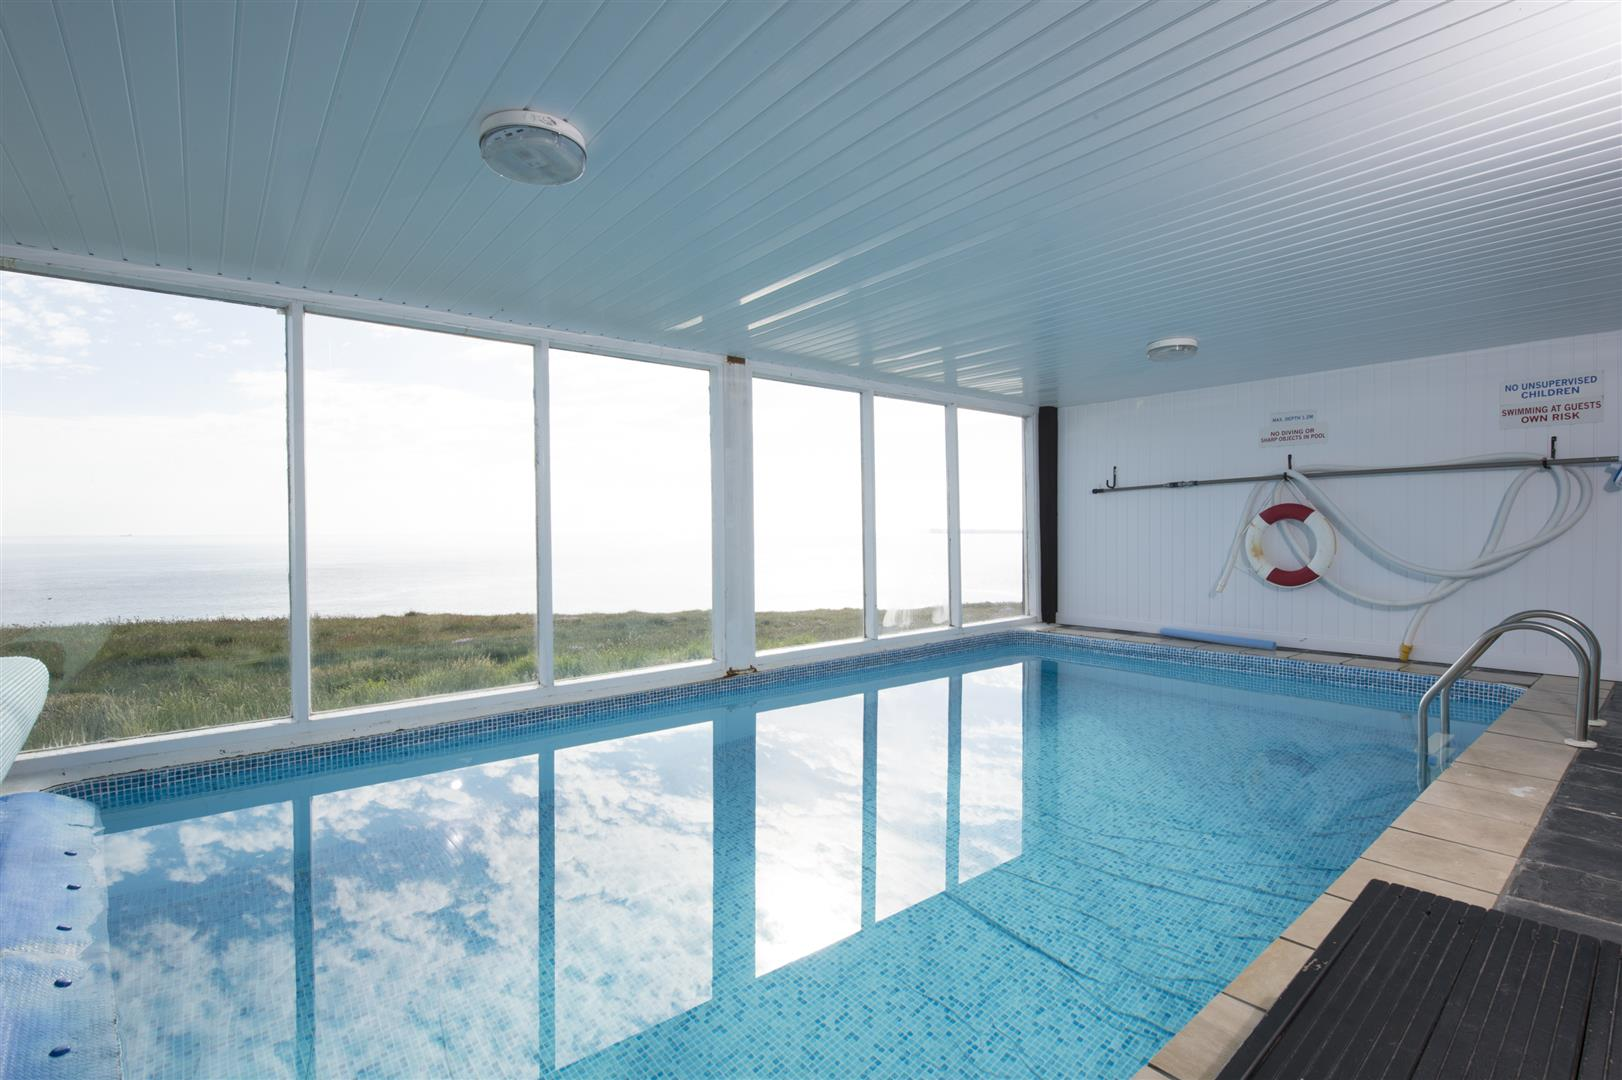 Swimming pool, sauna and gym room